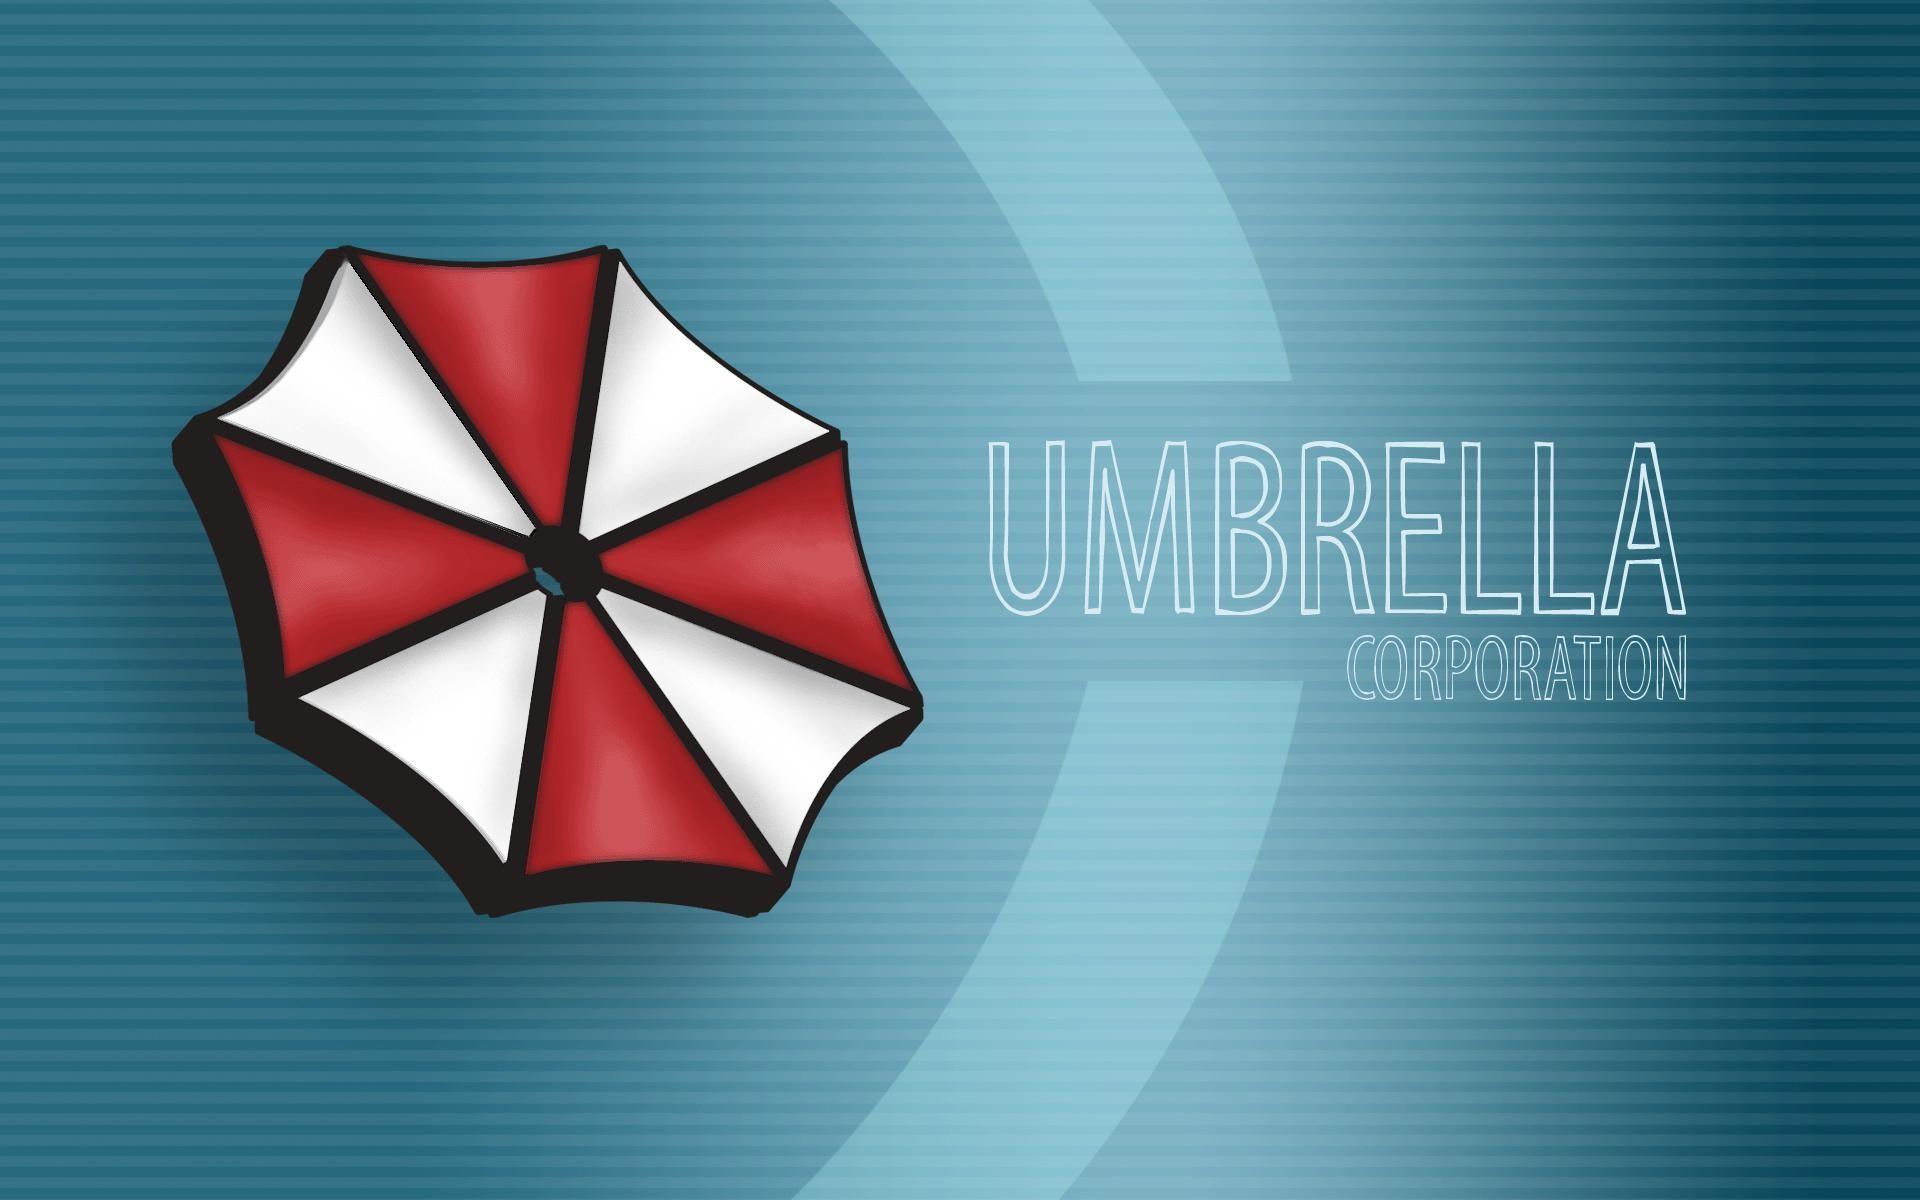 Umbrella Theme in Windows 10!